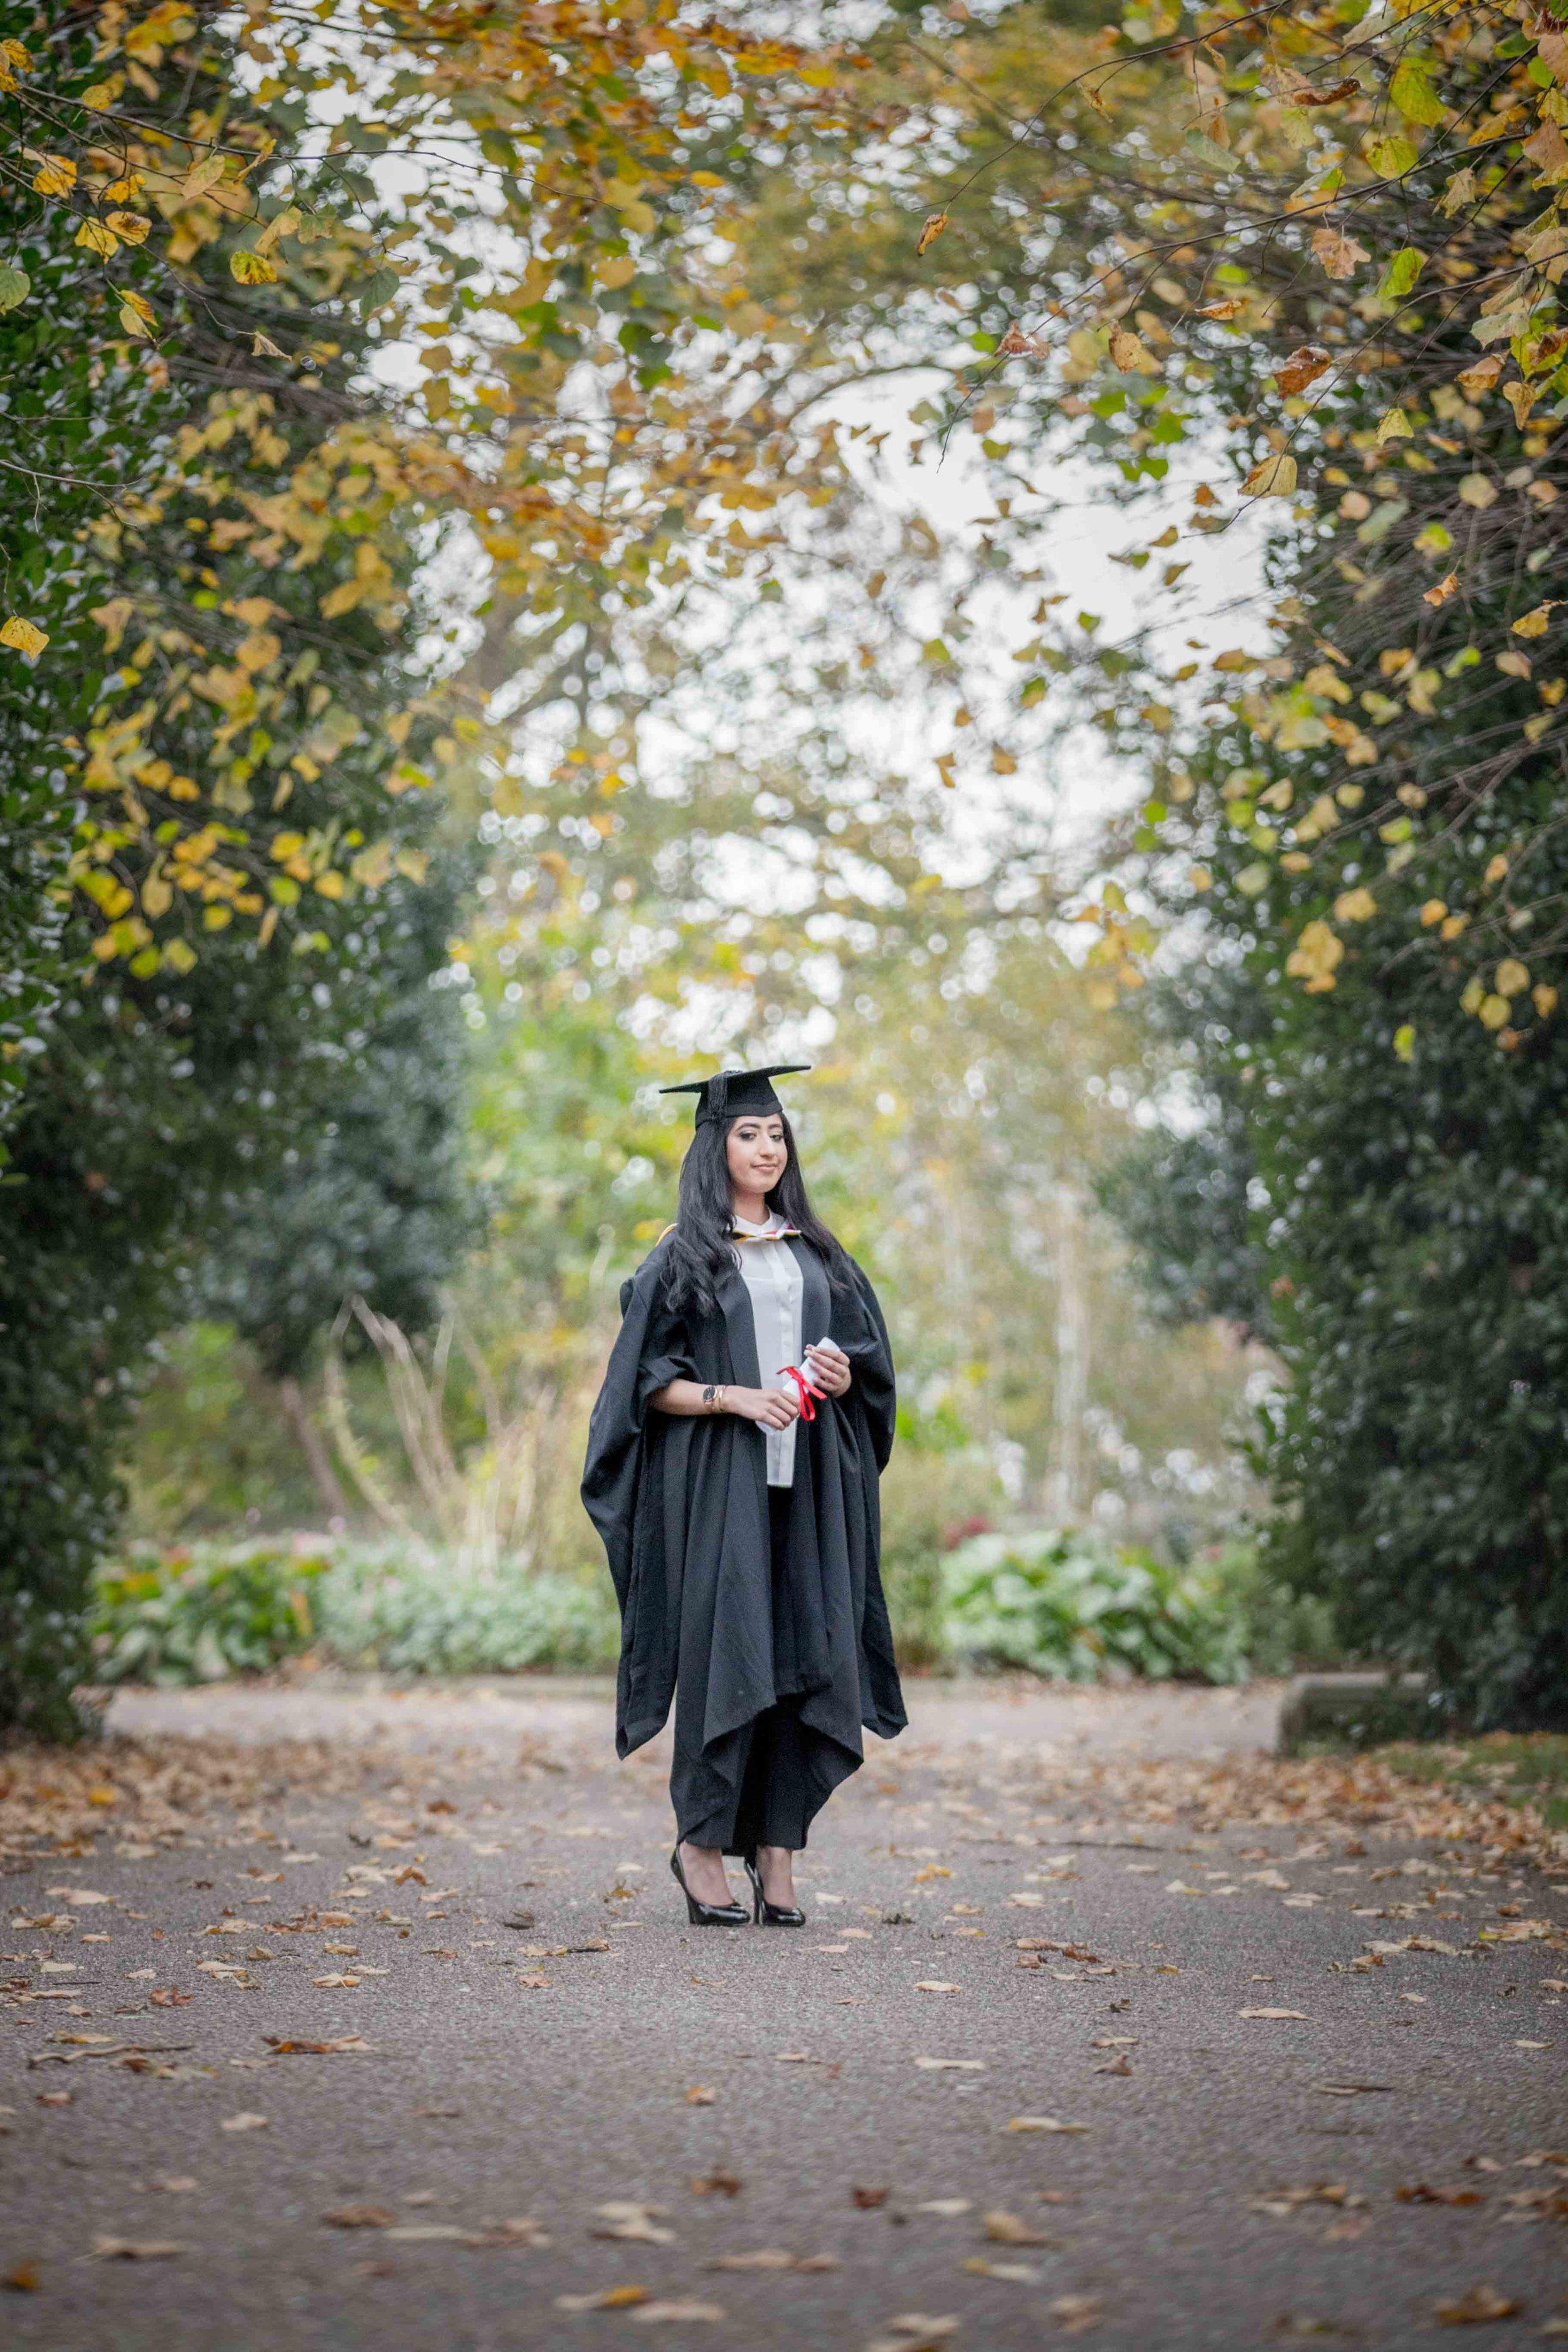 chester-university-graduation-ceremony-photography-photoshoot-graduation-photographer-Bristol-London-Cardiff-Birmingham-Chester-Natalia-smith-photography-15.jpg